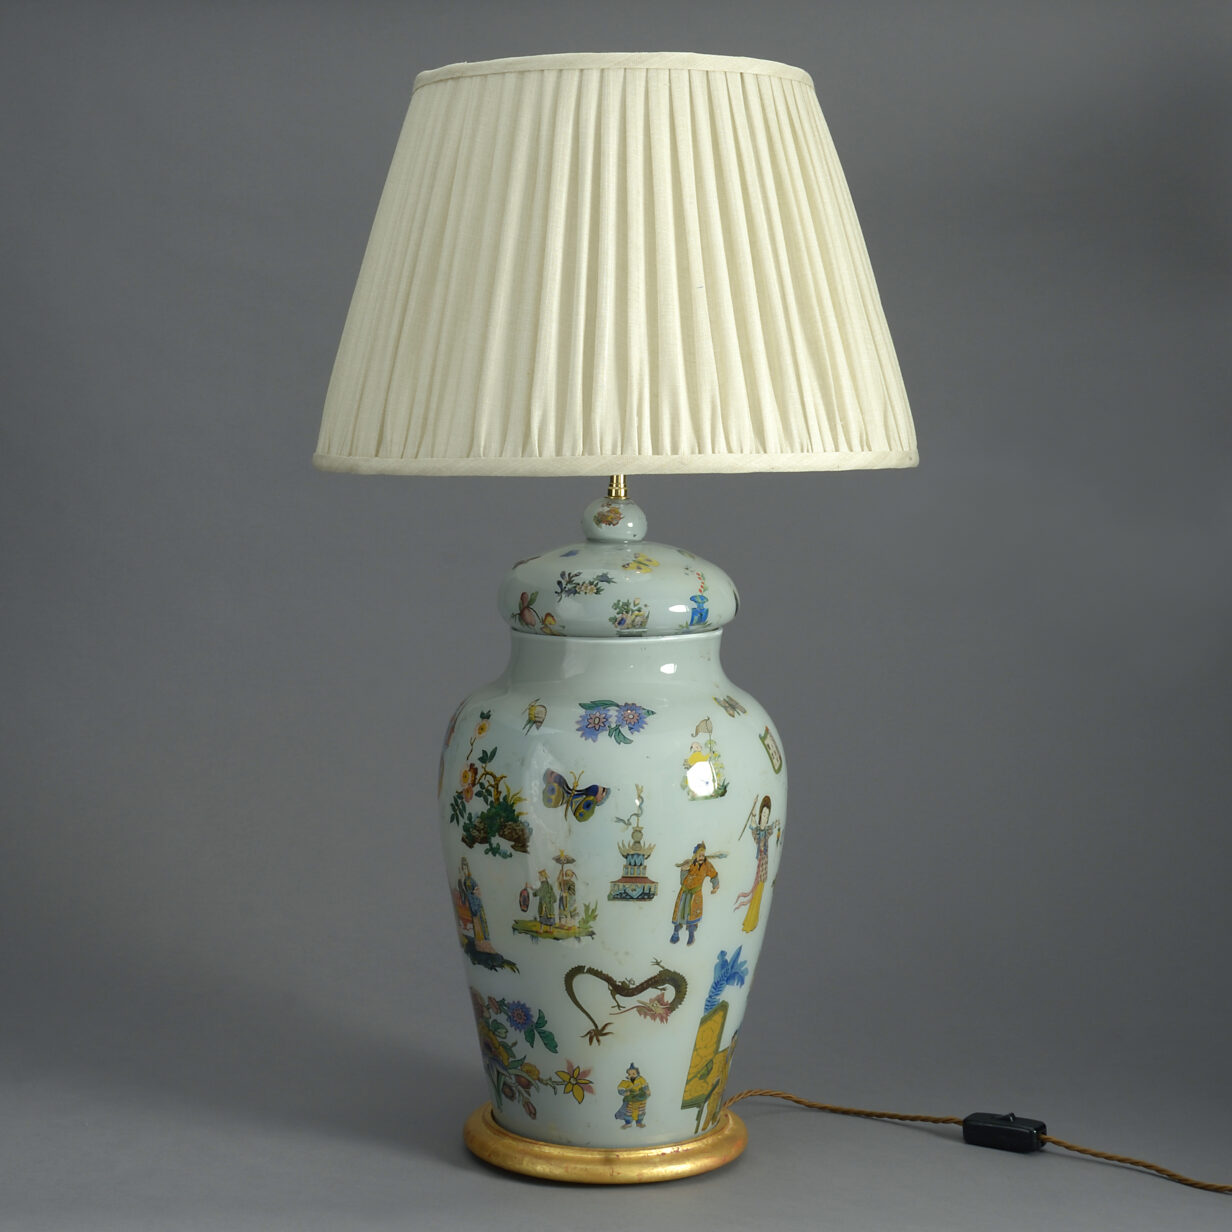 Lidded Decalcomania Vase Lamp